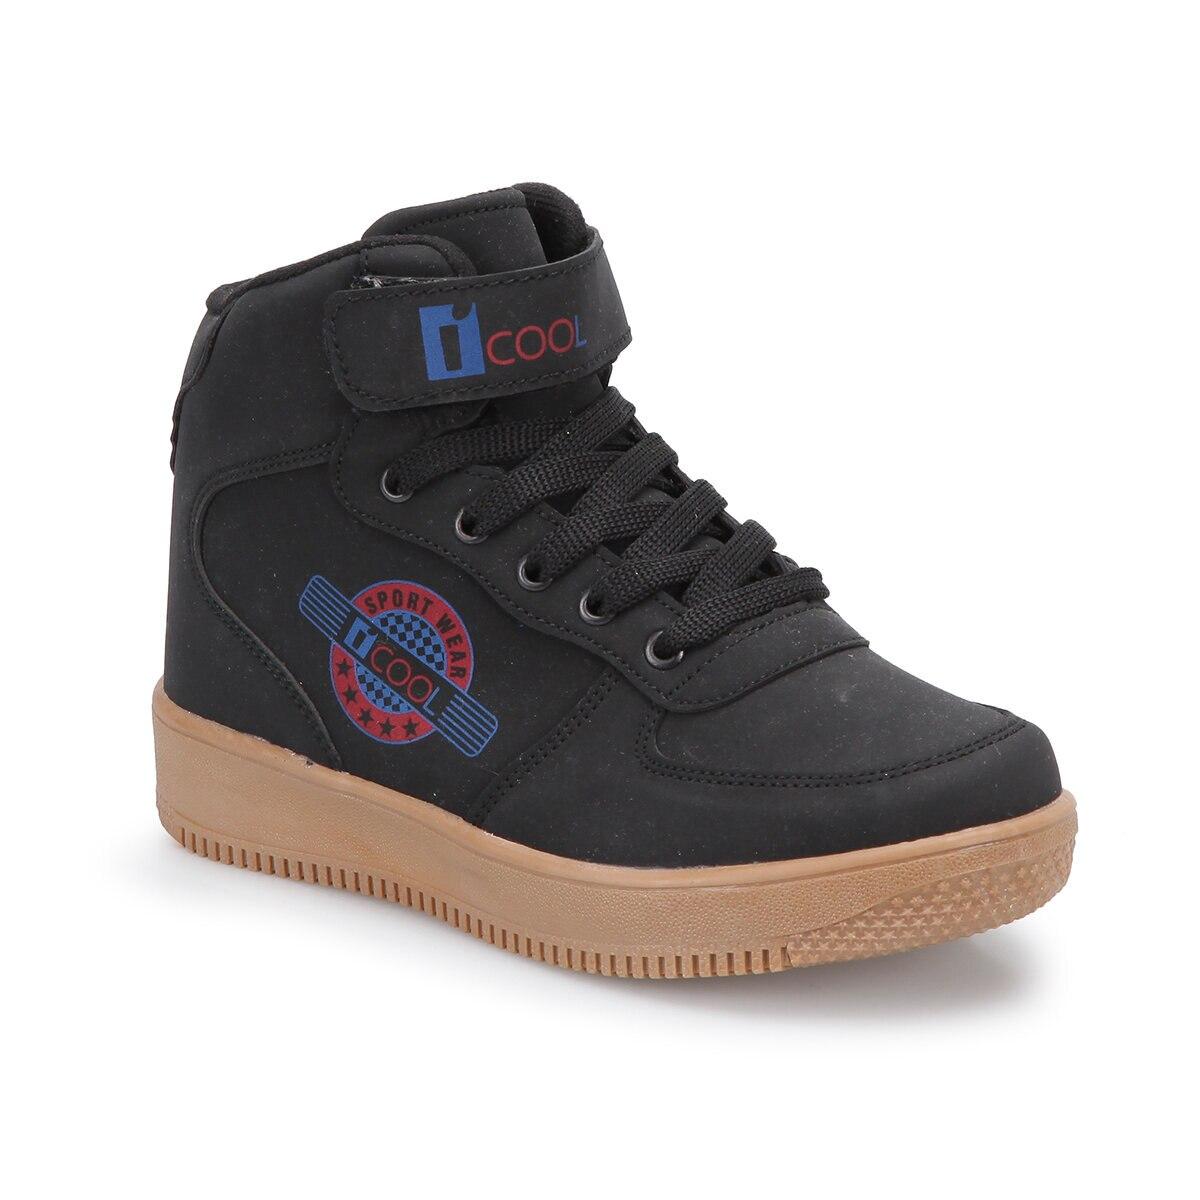 FLO FLASH HI Black Male Child Sneaker Shoes I-Cool